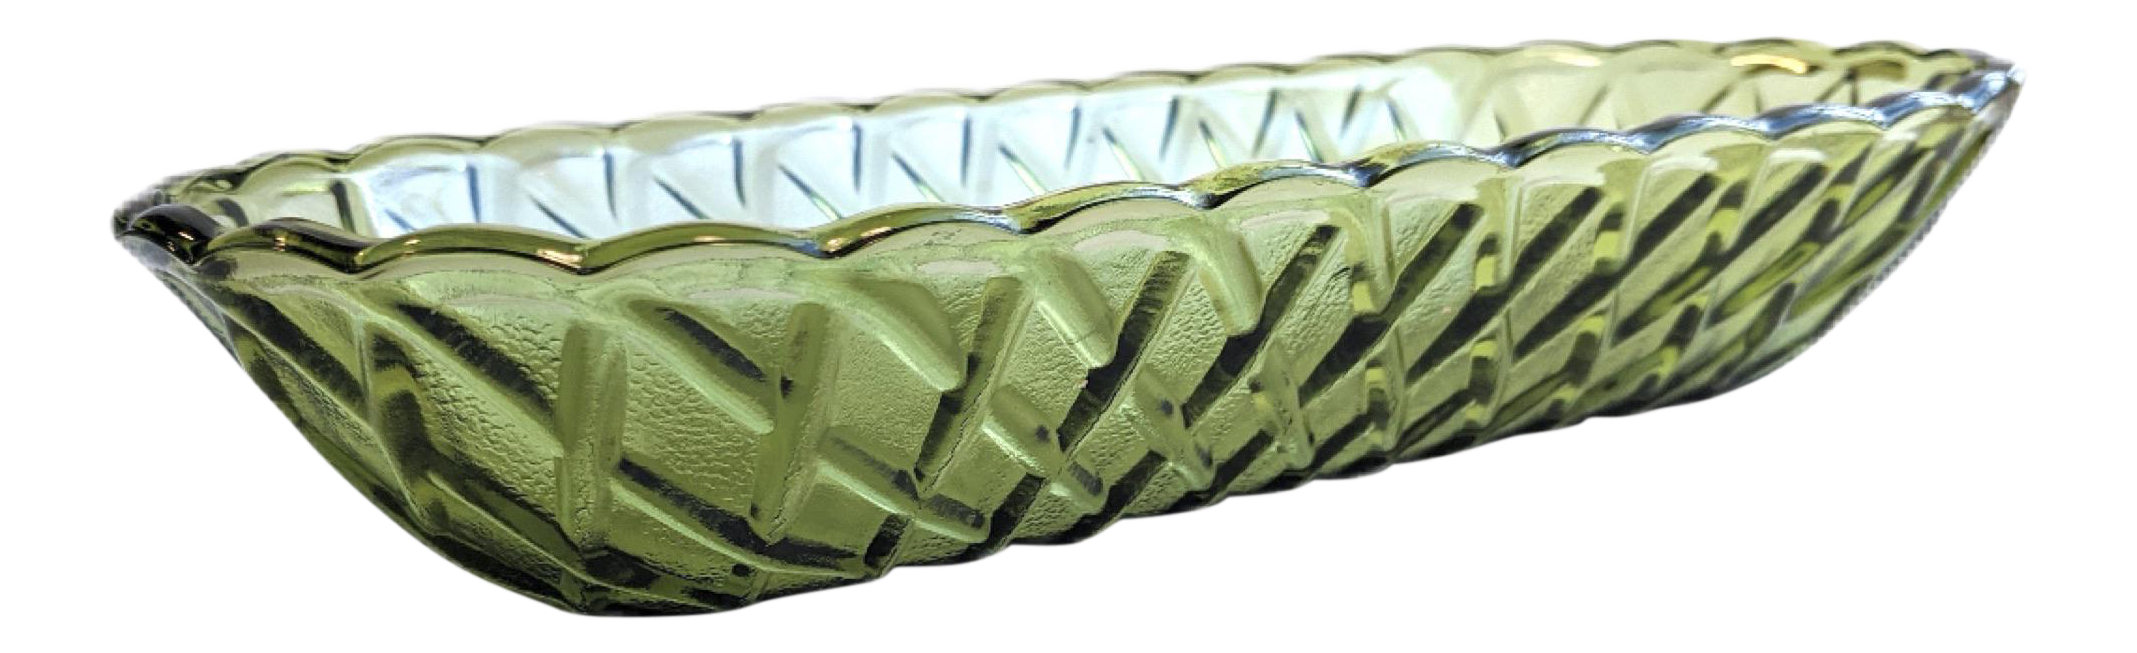 Indiana Glass Co Basket-Weave Glass Gondola Dish in Avocado Green